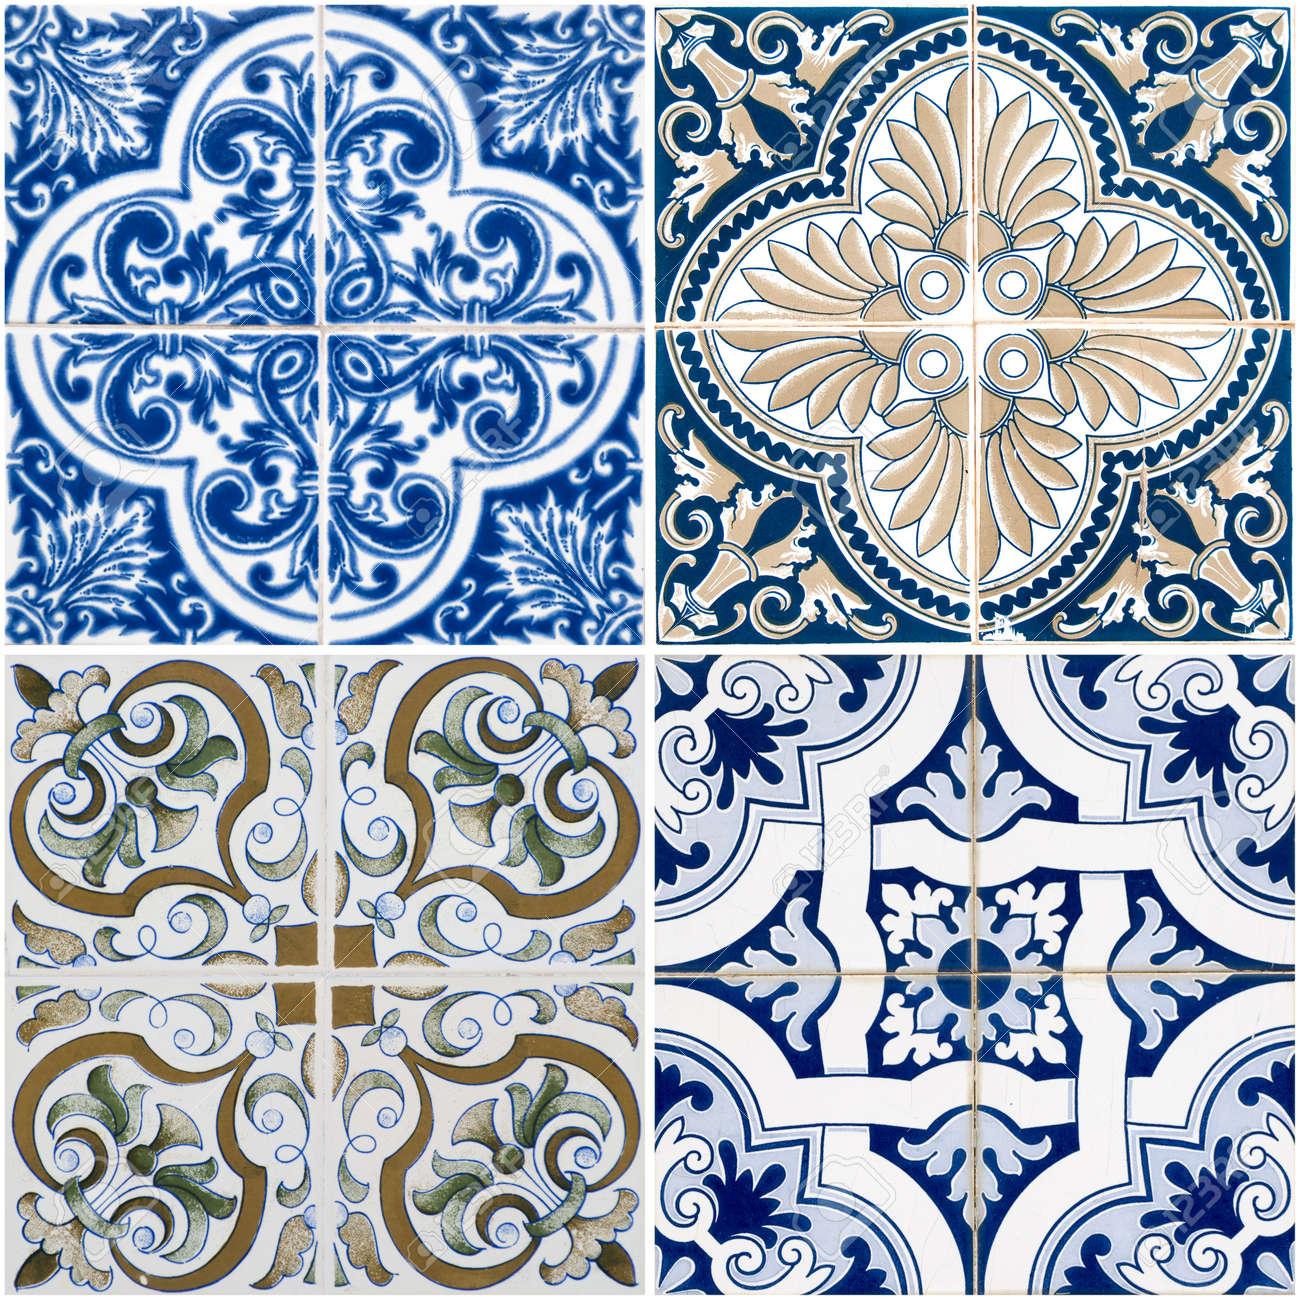 Colorful vintage ceramic tiles wall decoration Stock Photo   12725642. Colorful Vintage Ceramic Tiles Wall Decoration Stock Photo